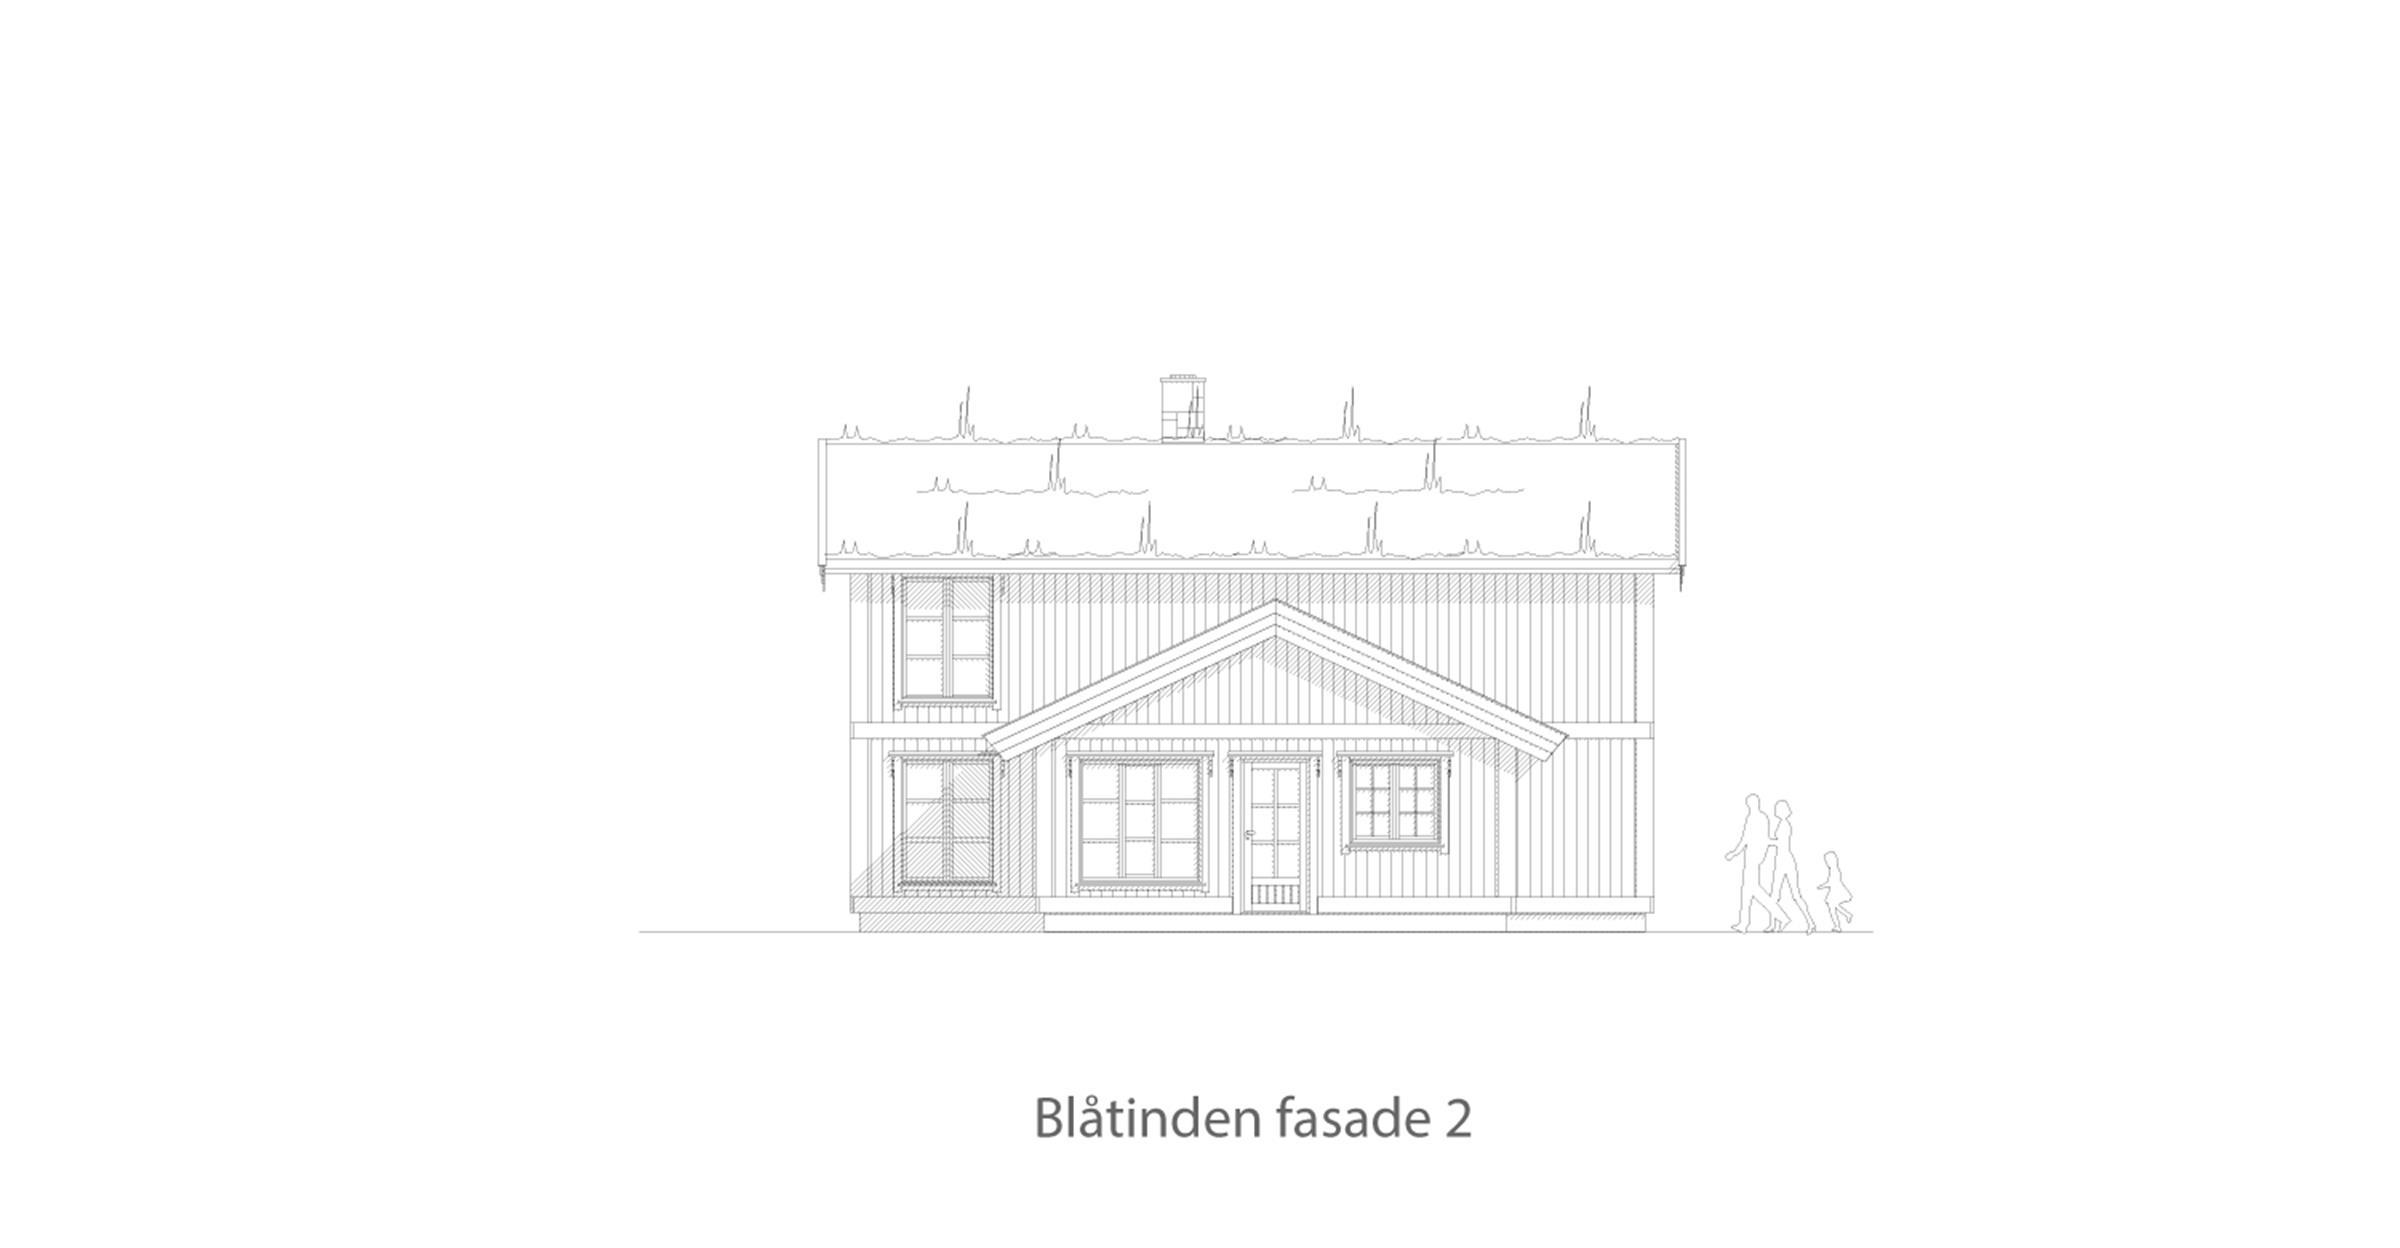 Blåtinden fasade 2